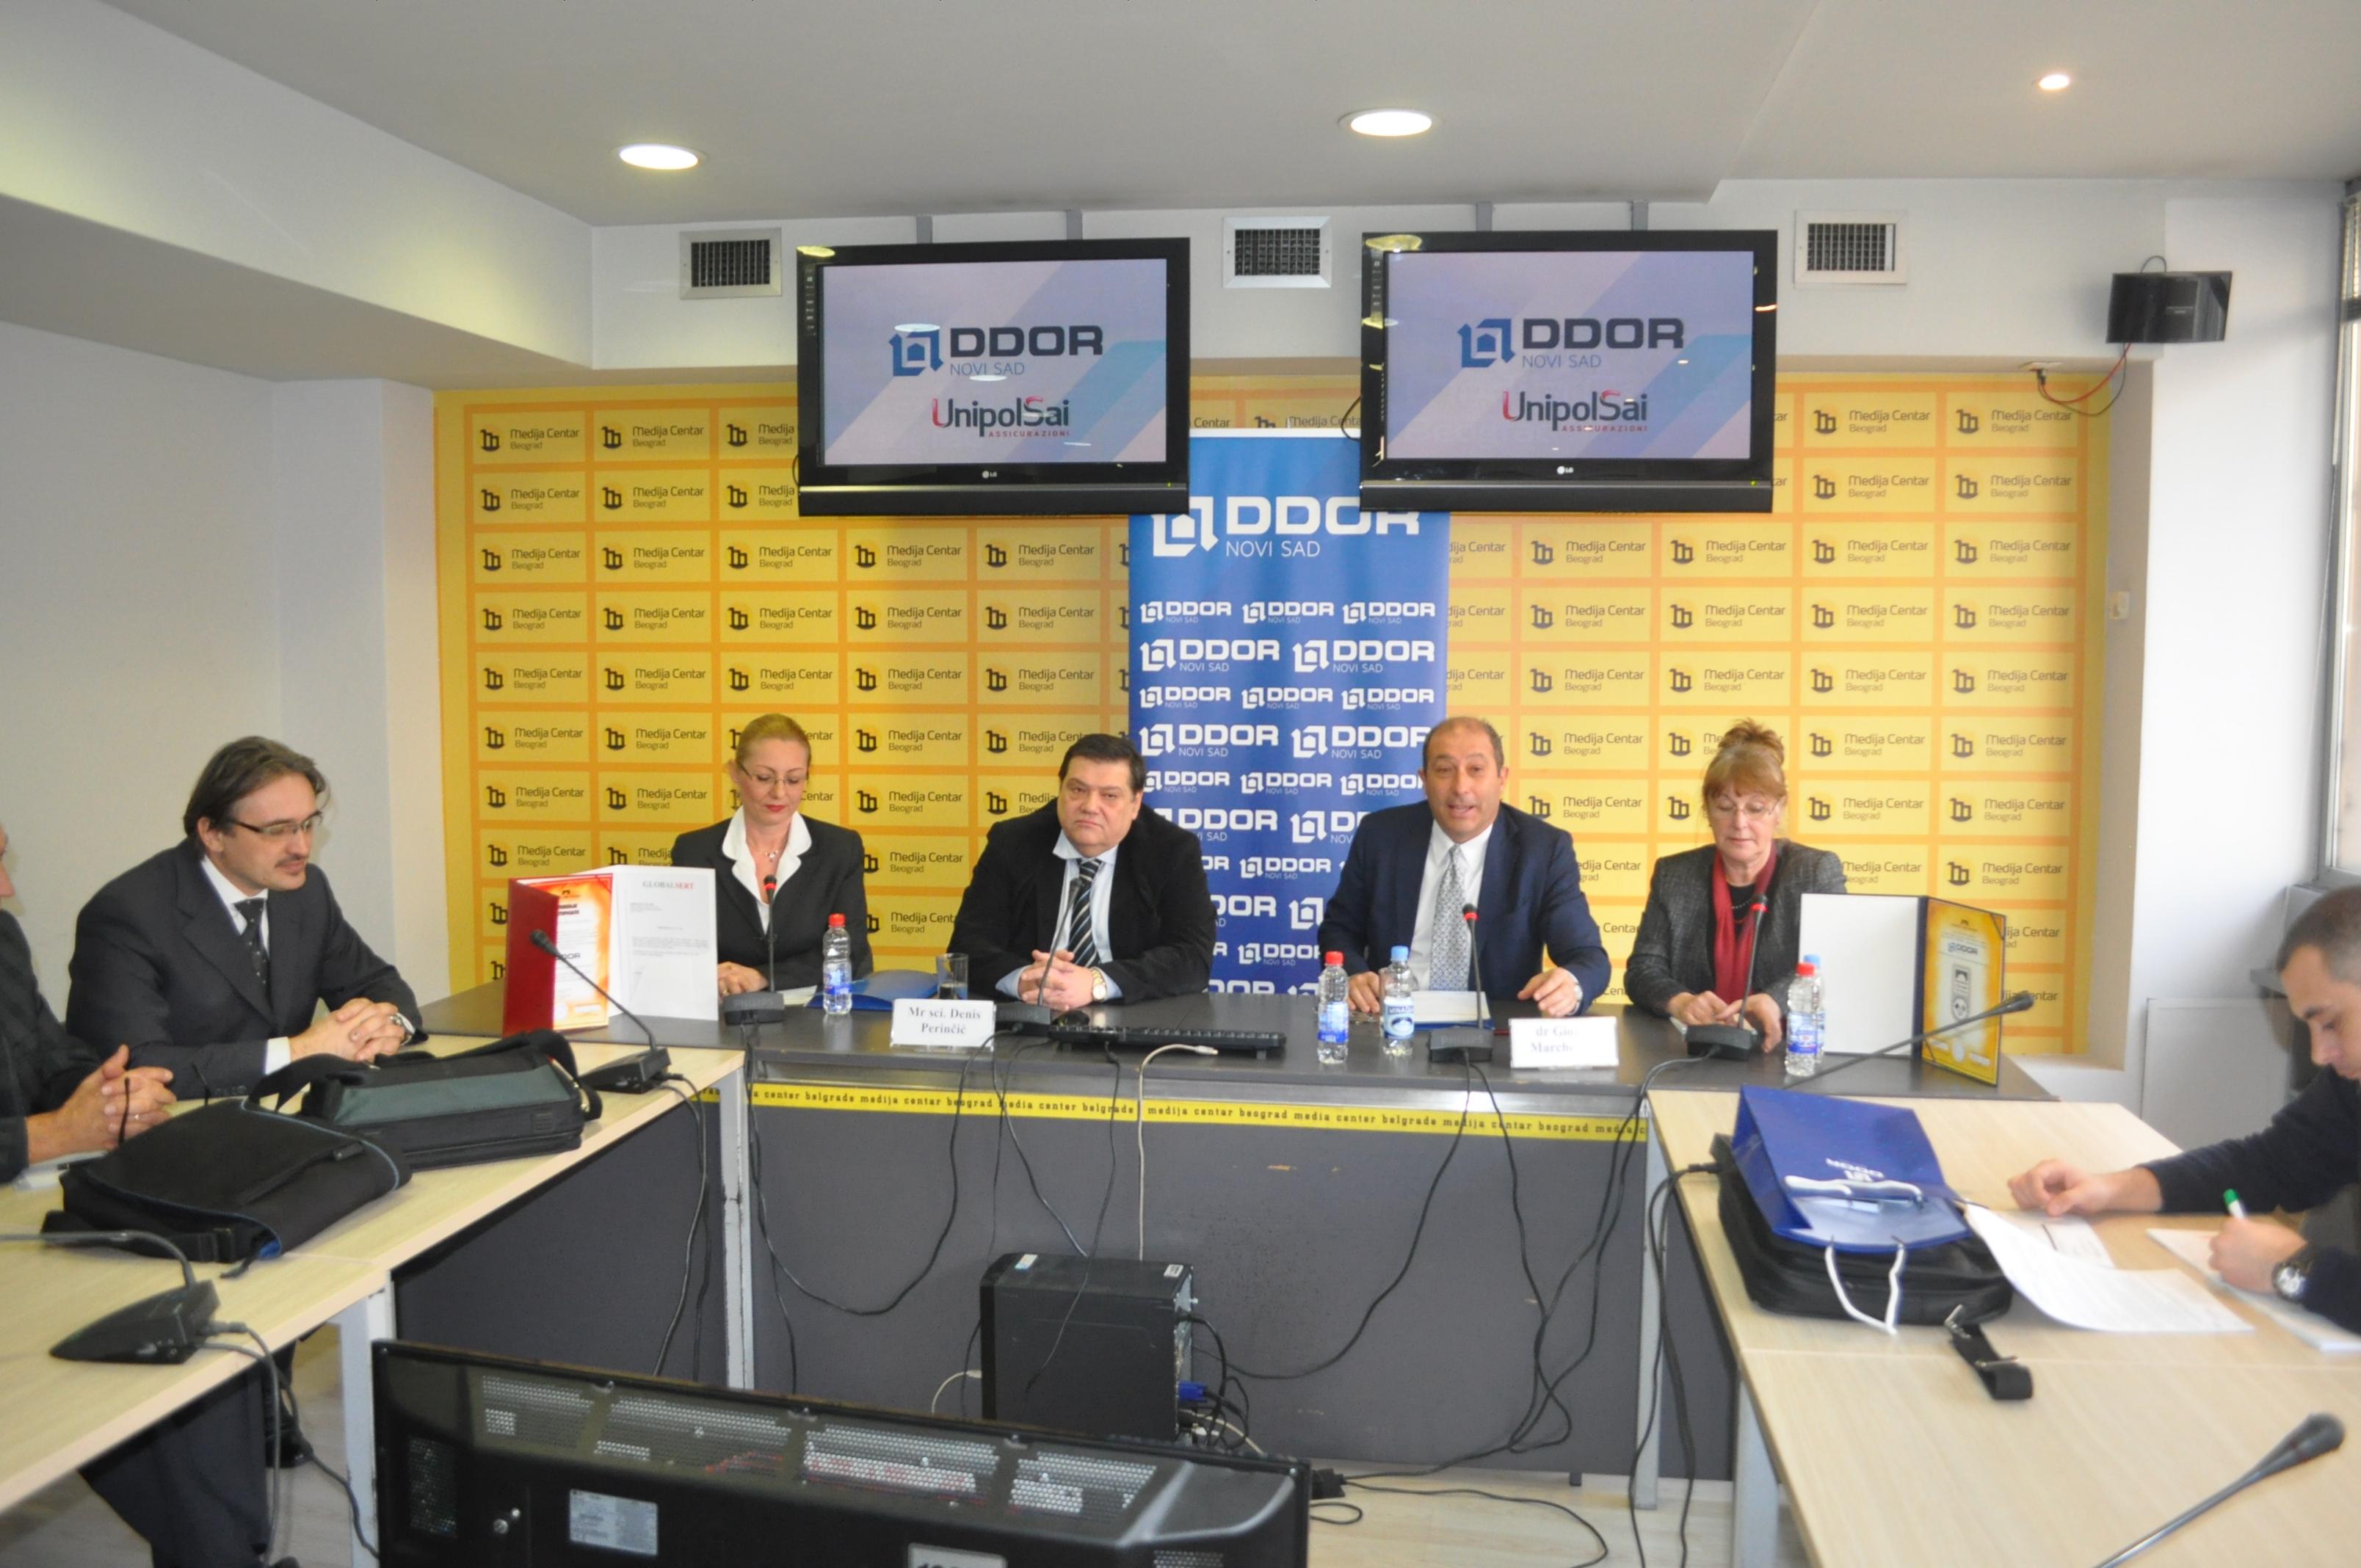 DDOR Novi Sad, Press konferencija, Medija centar, Beograd